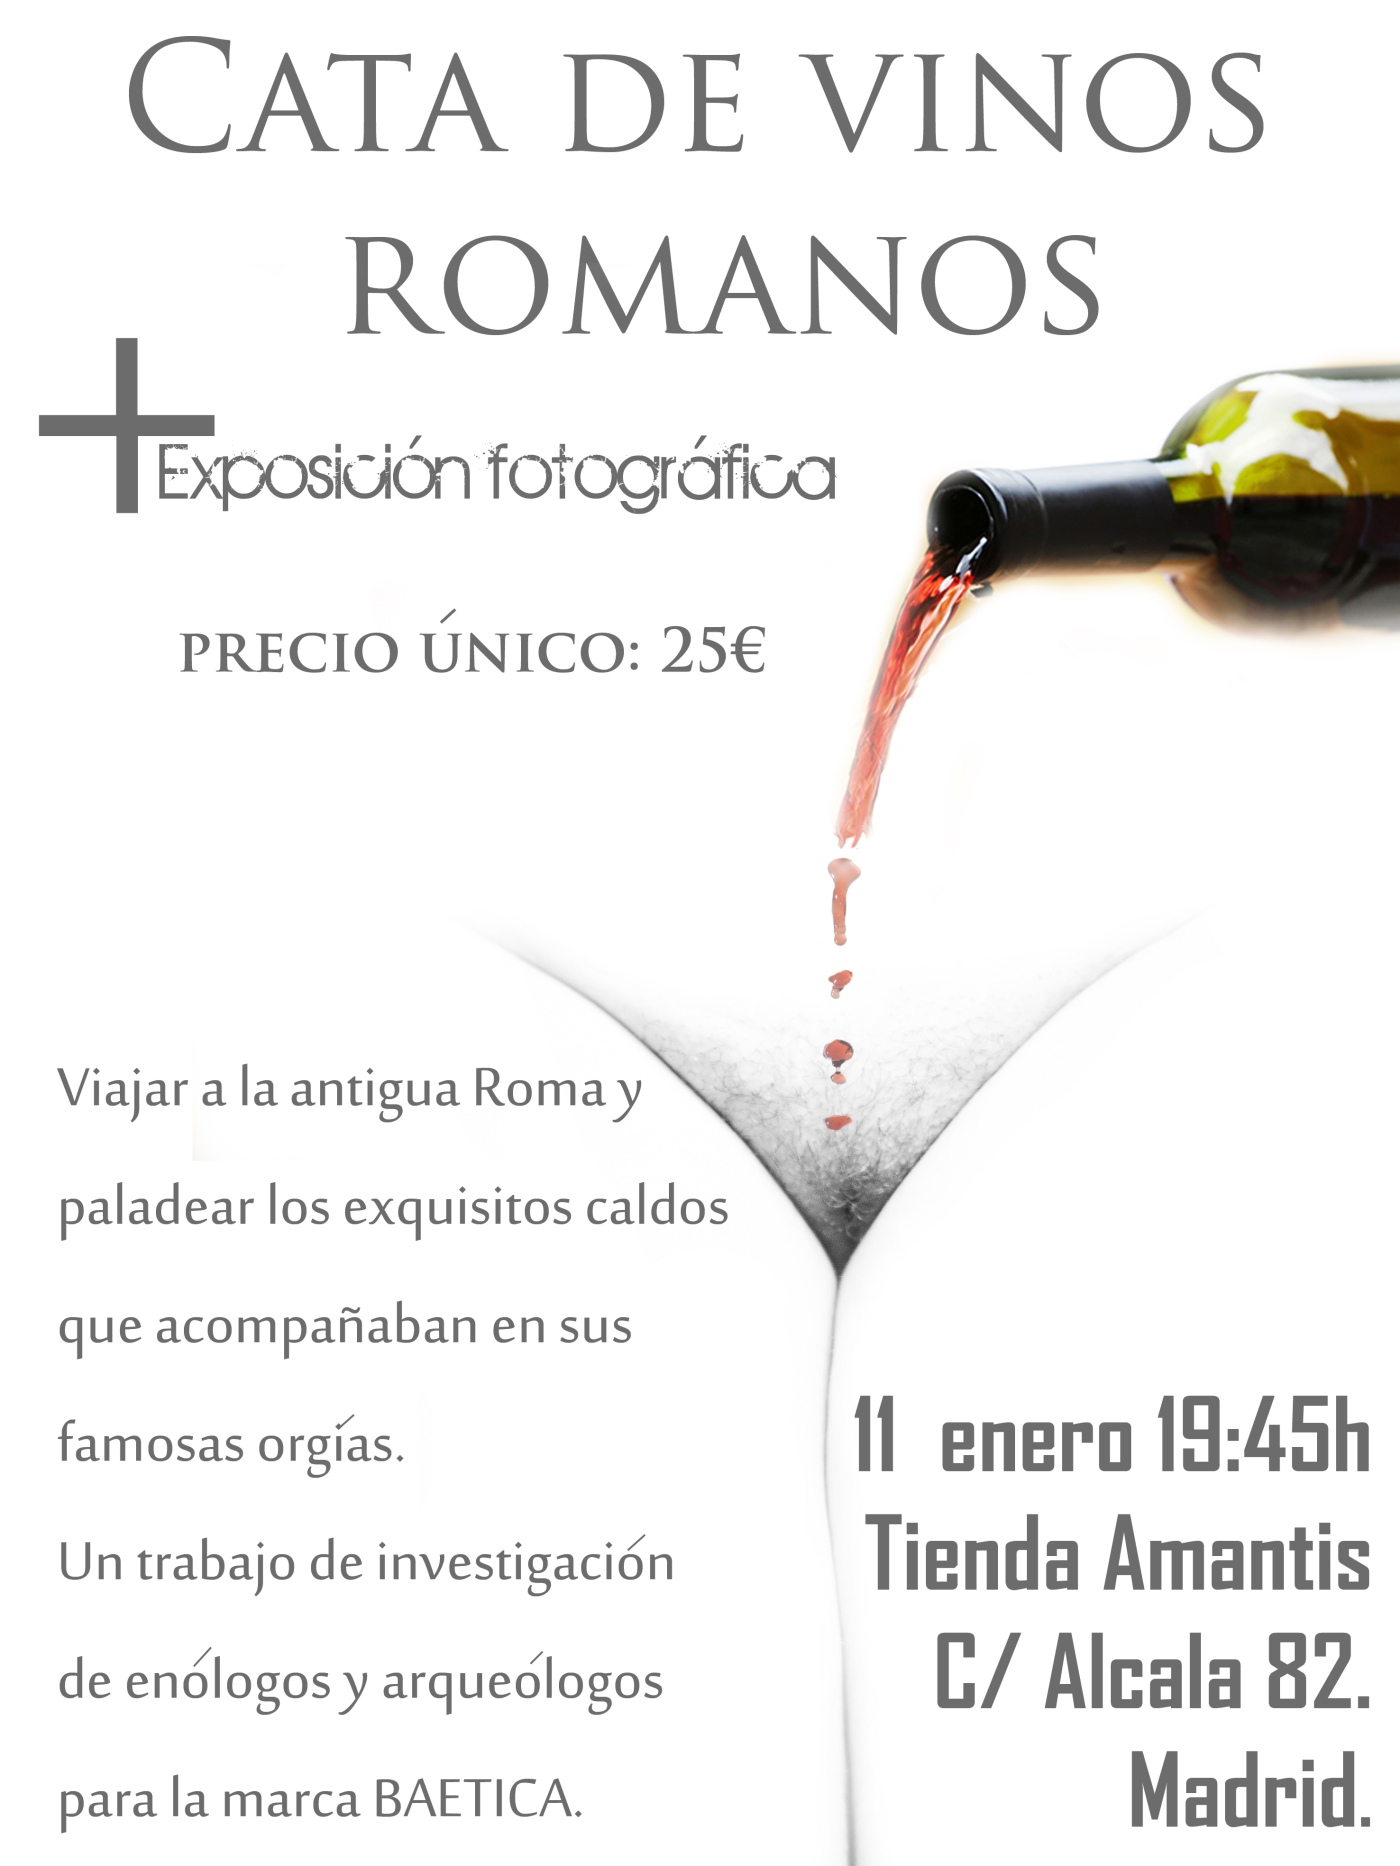 cata de vinos romanos